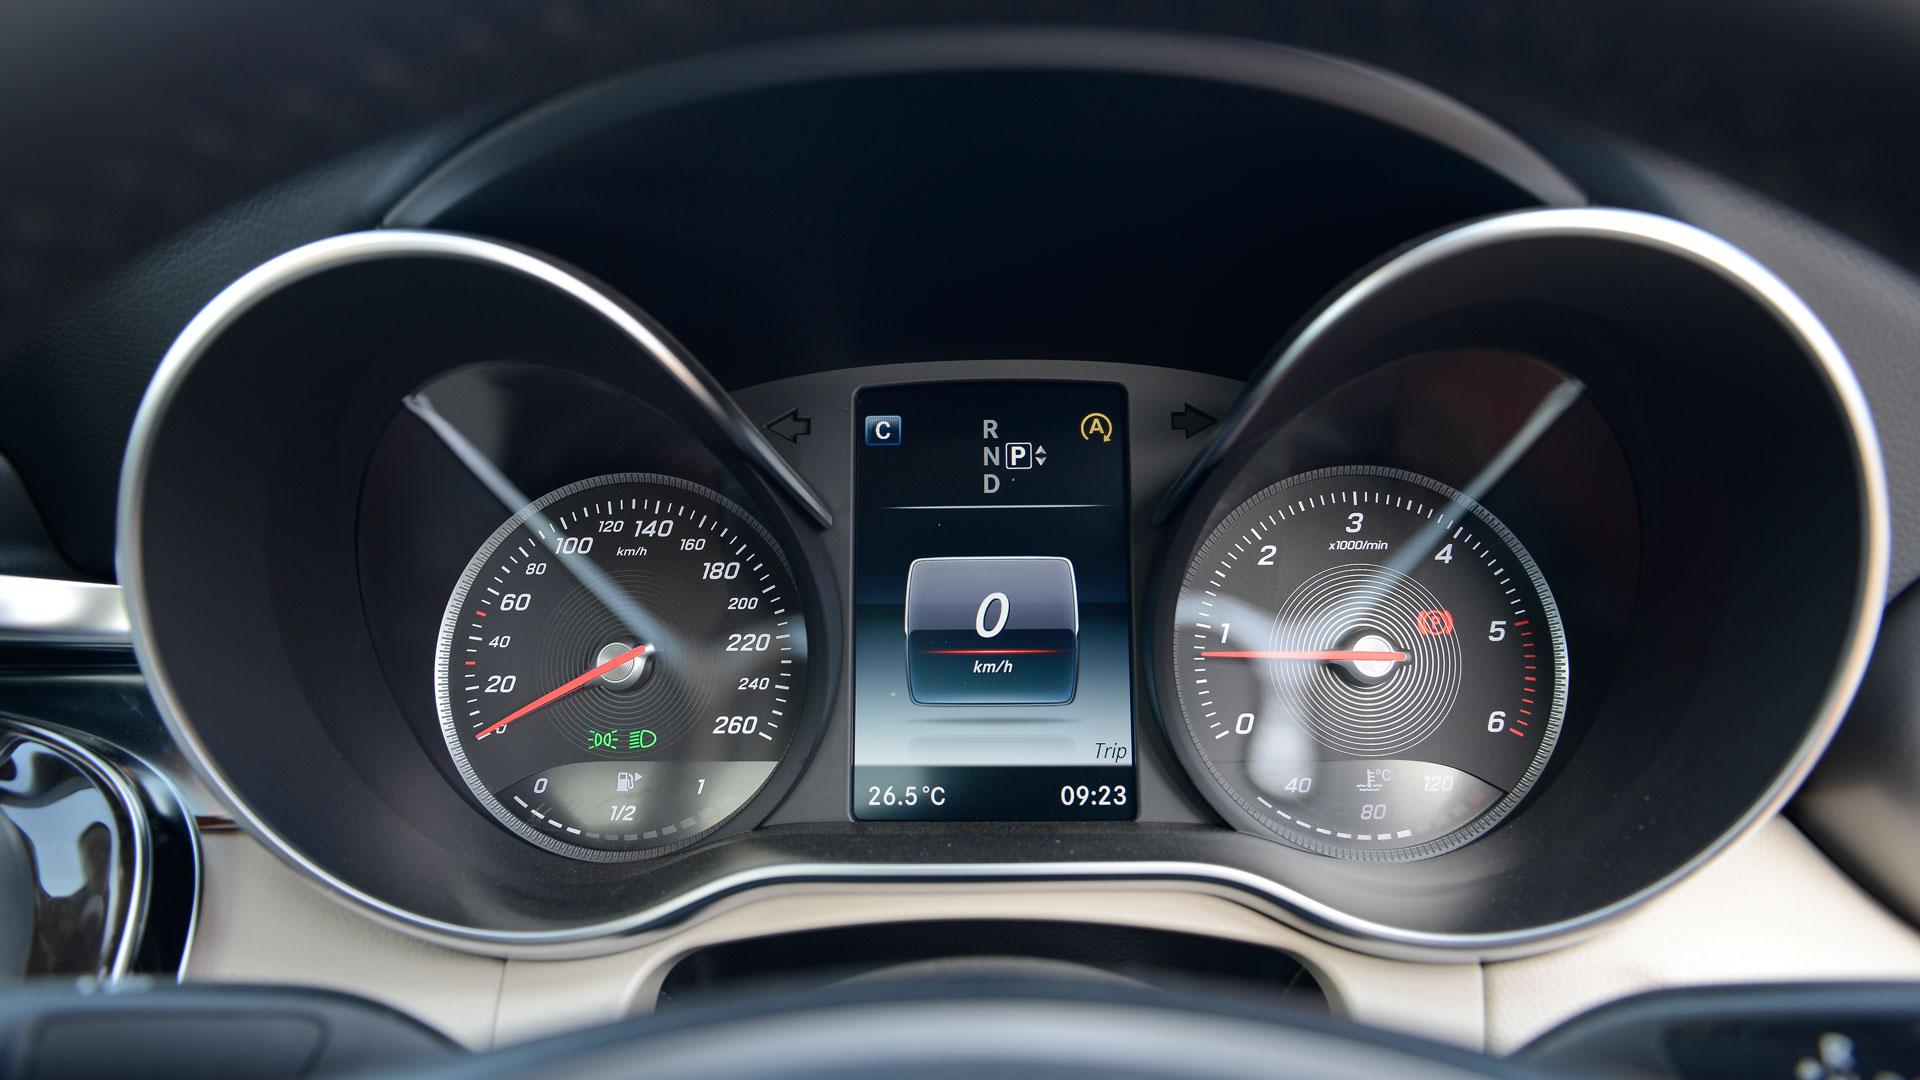 Mercedesbenz-cclass-2015-C 220 CDI Style Interior